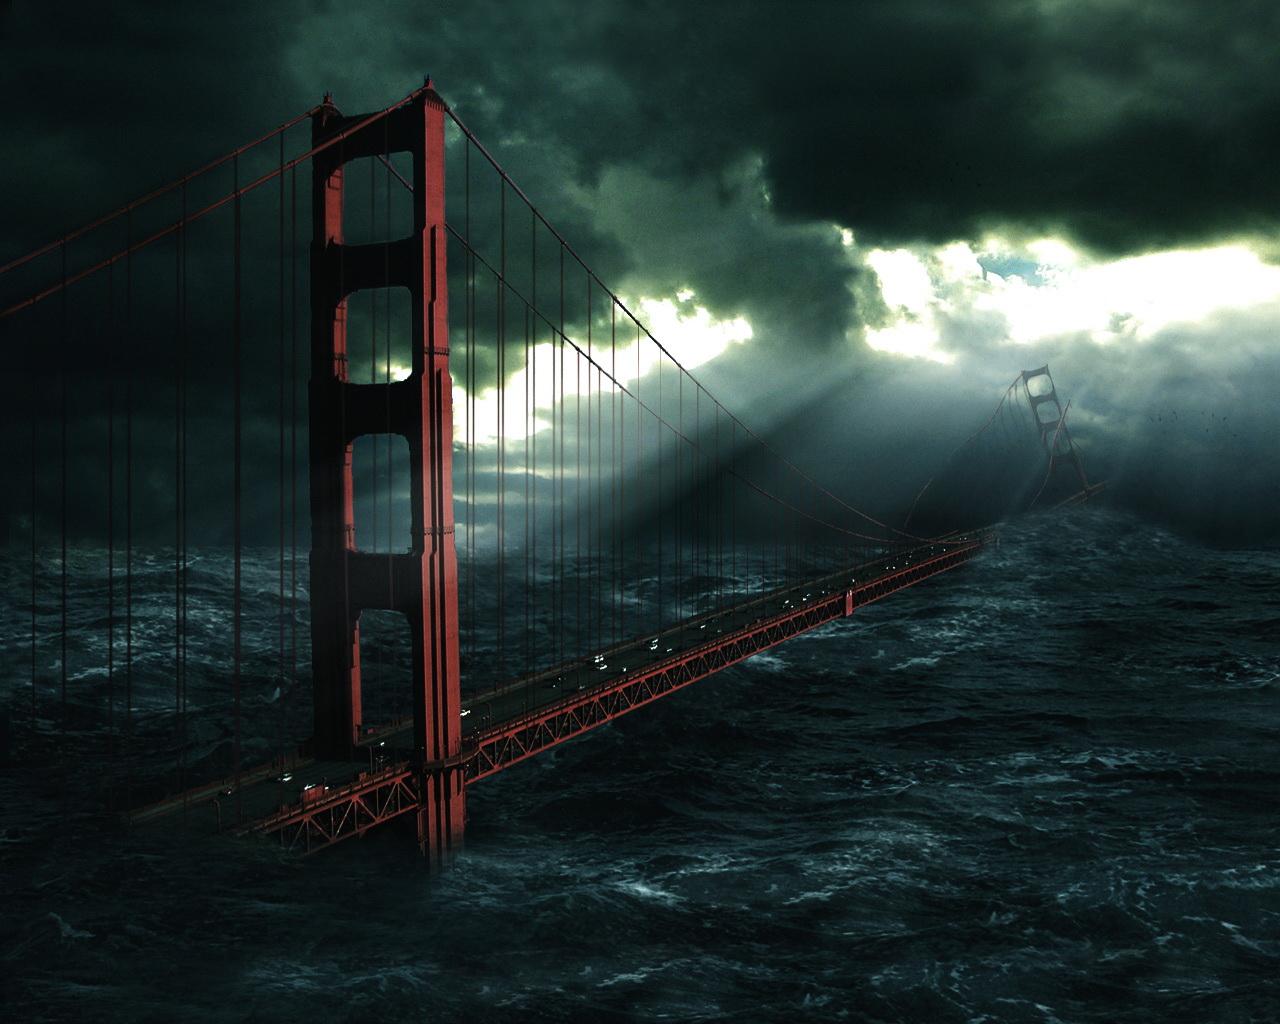 Desktop wallpapers » Creative Wallpaper » Flood in Los Angeles ...